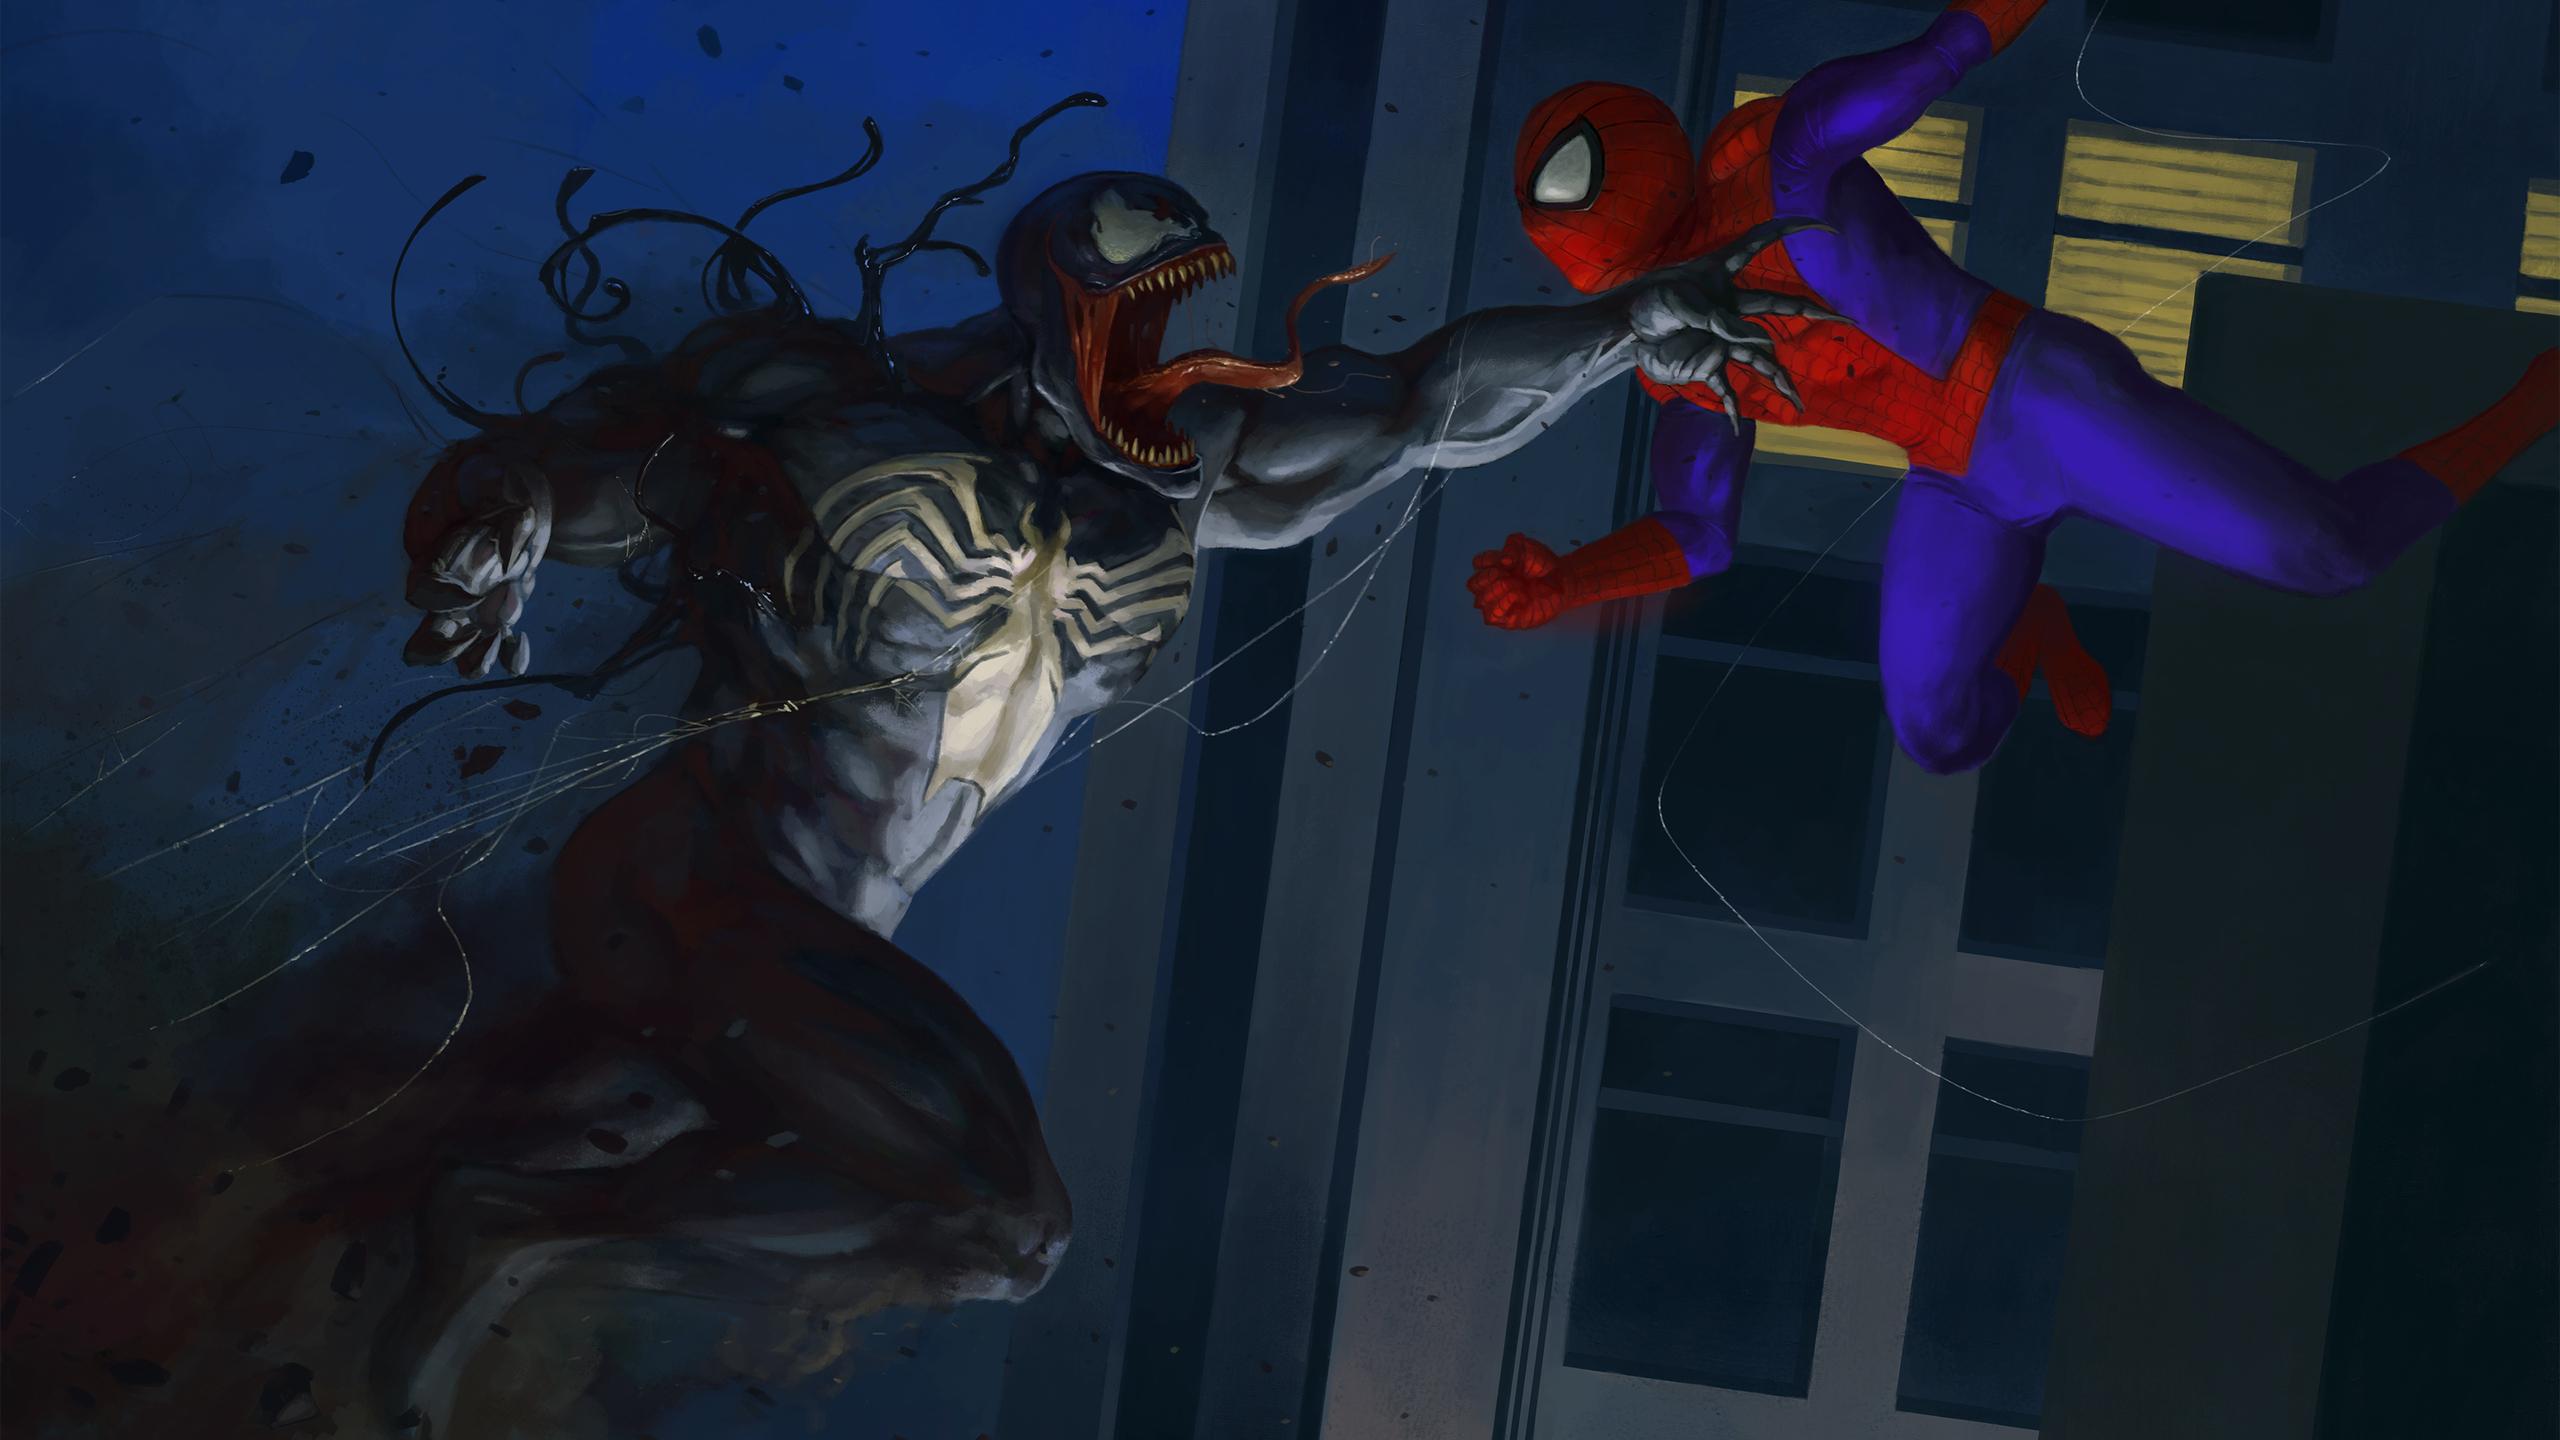 2560x1440 Venom And Spiderman Artwork 1440P Resolution HD ...